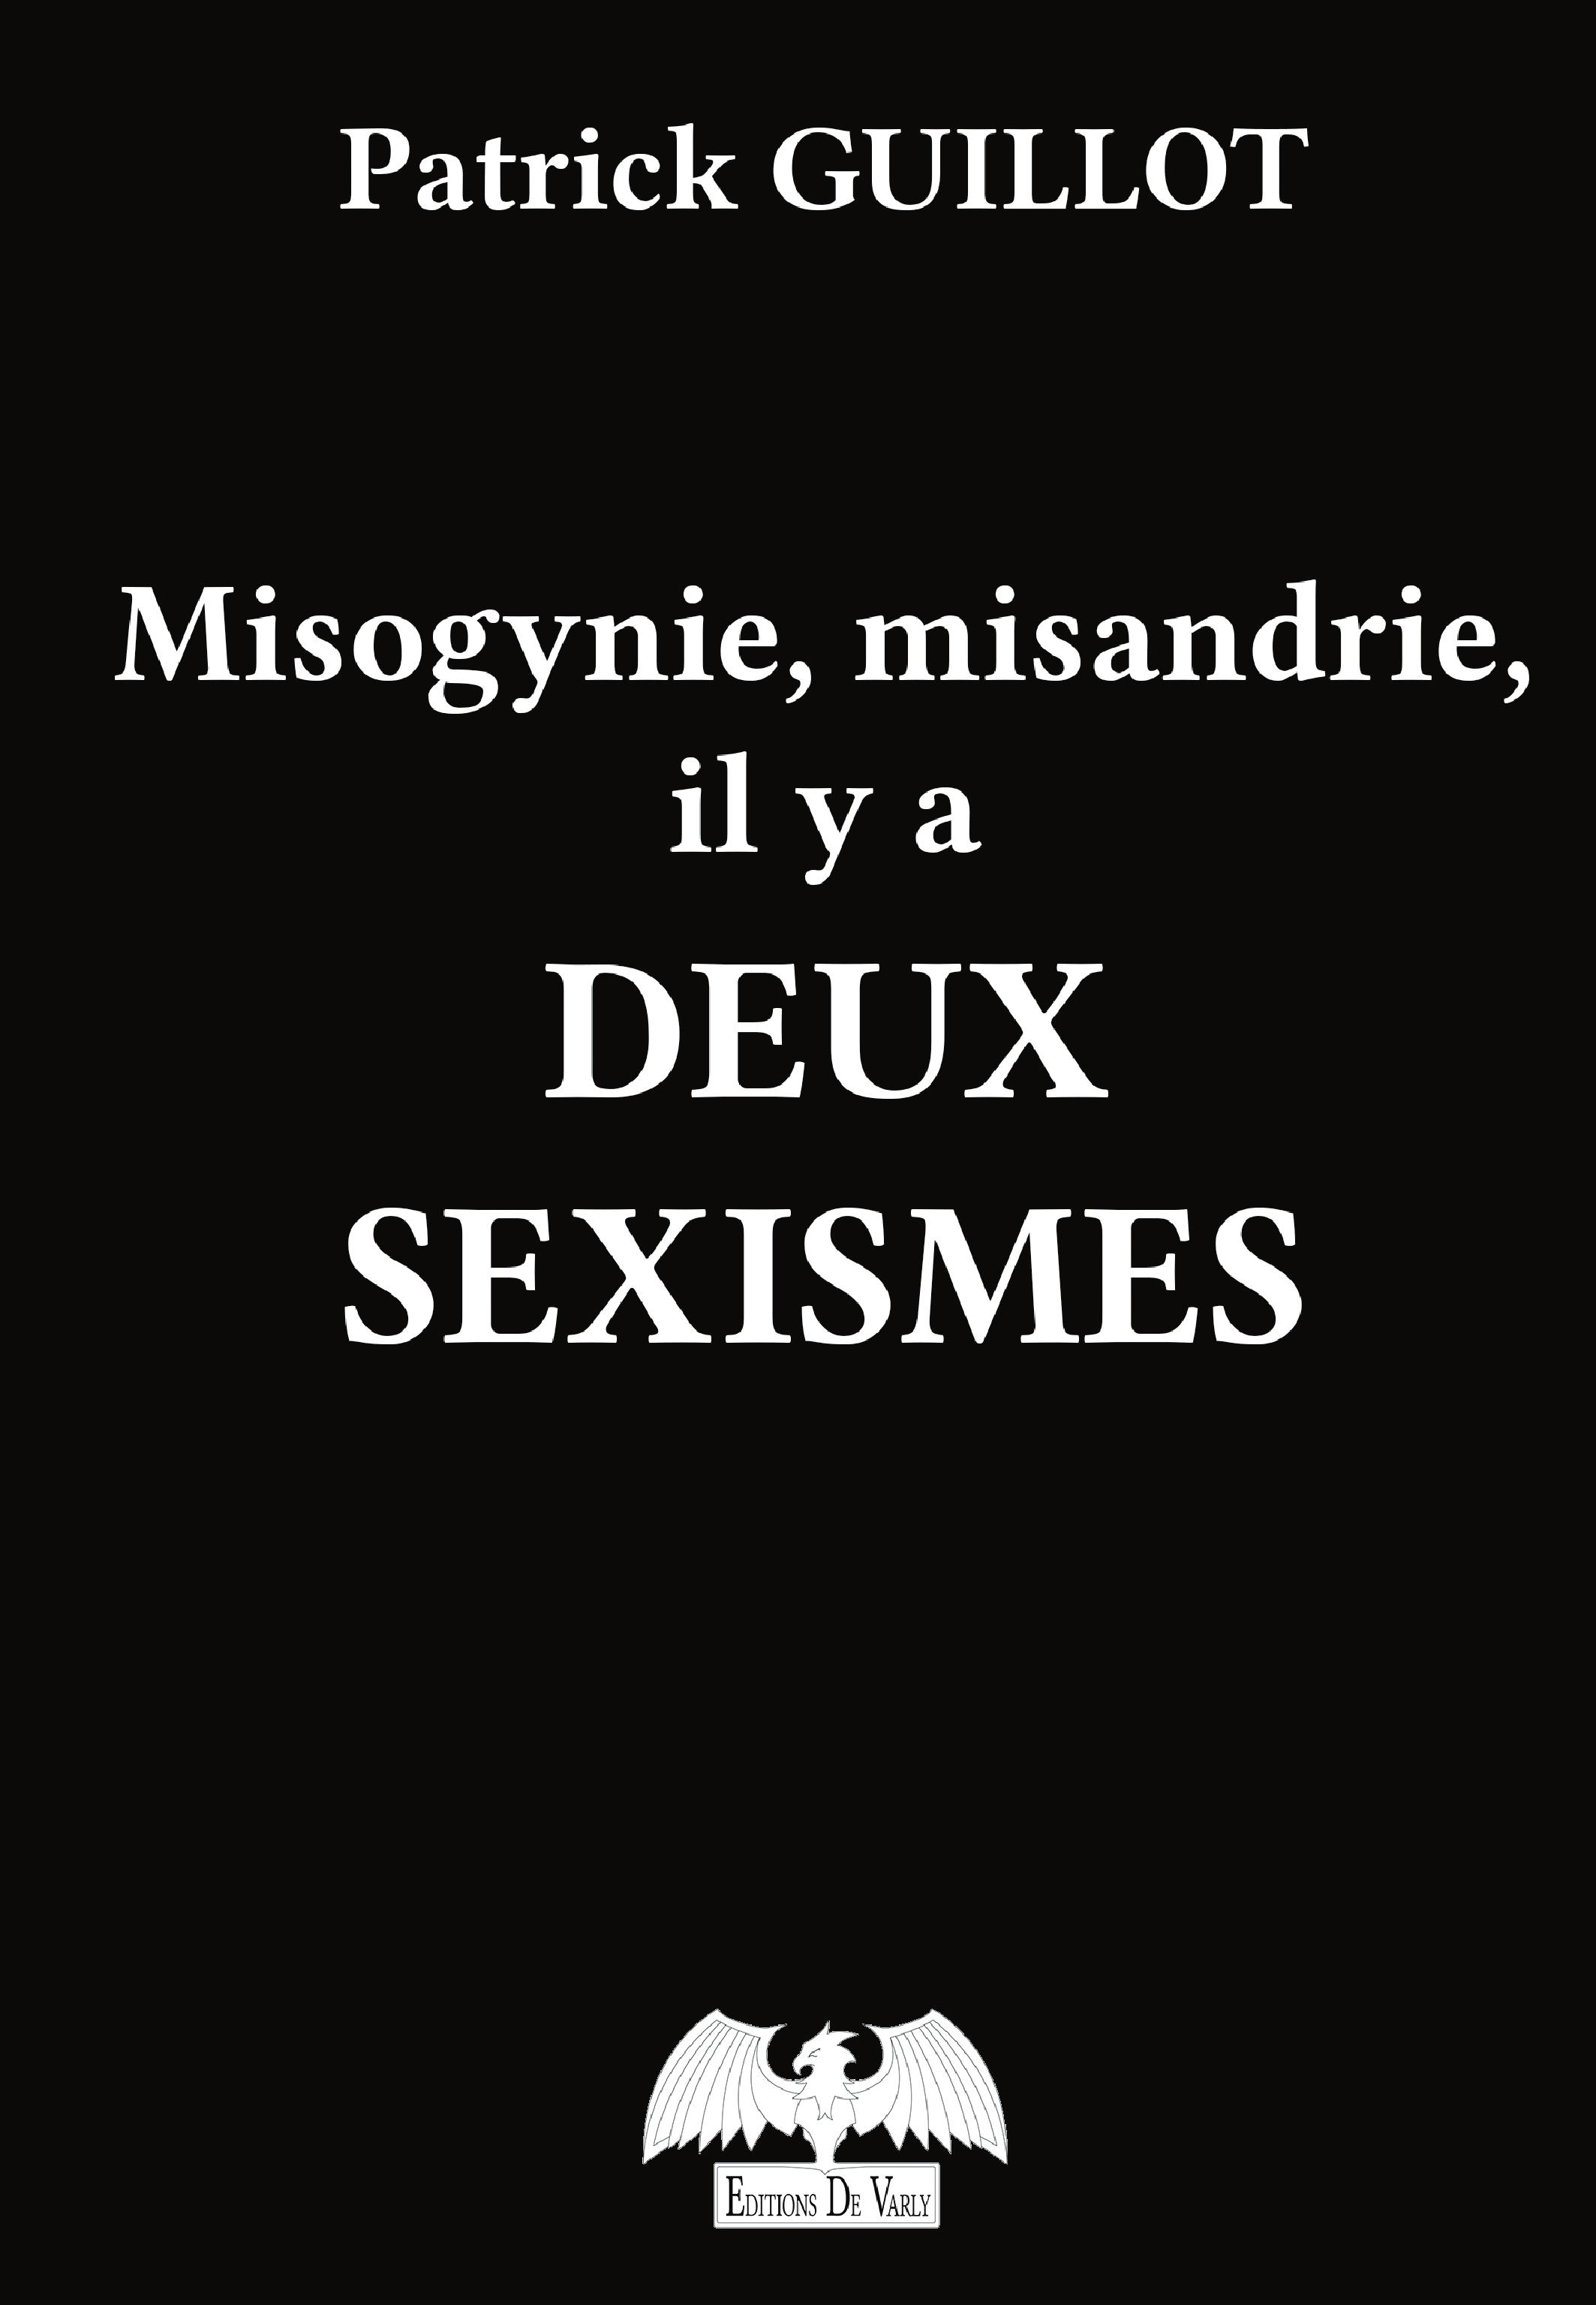 Misogynie, misandrie, deux sexismes